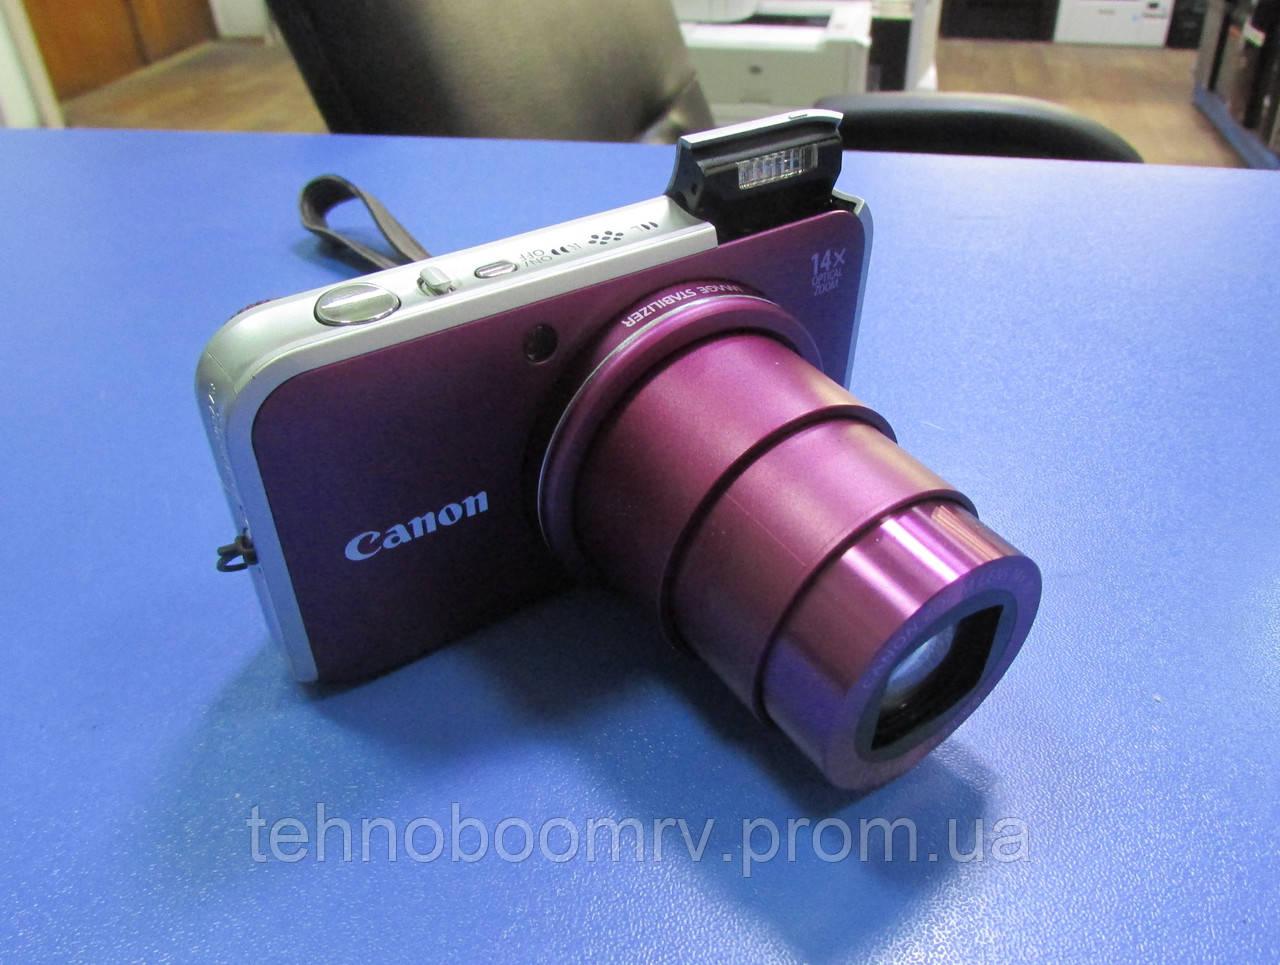 Фотоаппарат Canon SX210 IS - 14MP - ЗУМ: Оптич. 14Х; Цифр.4Х + подарок